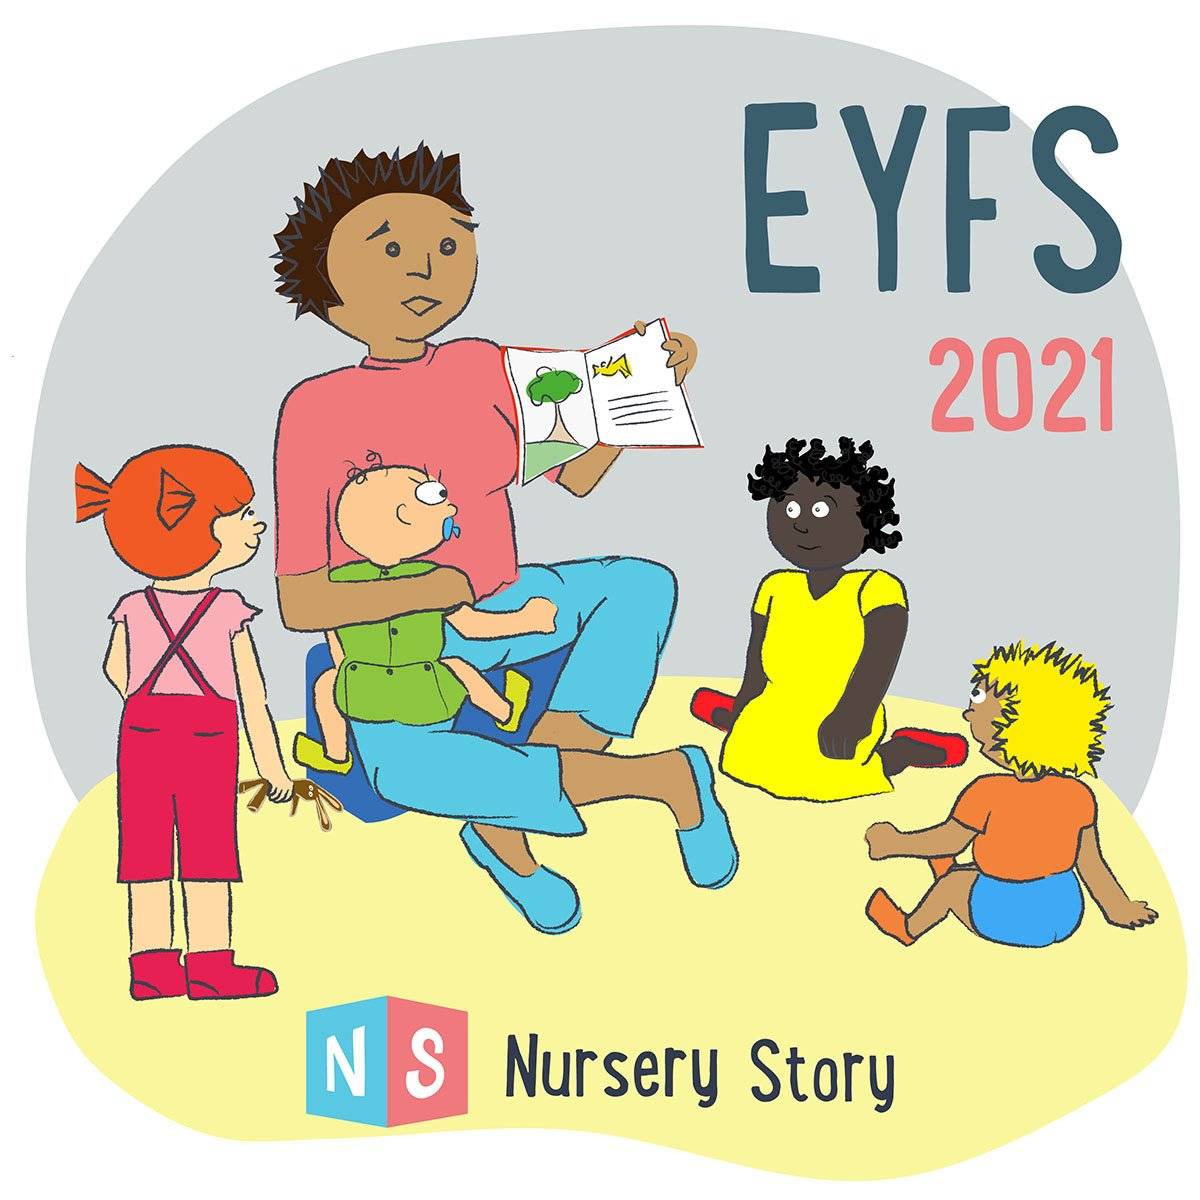 Getting Ready For EYFS 2021Getting Ready For EYFS 2021